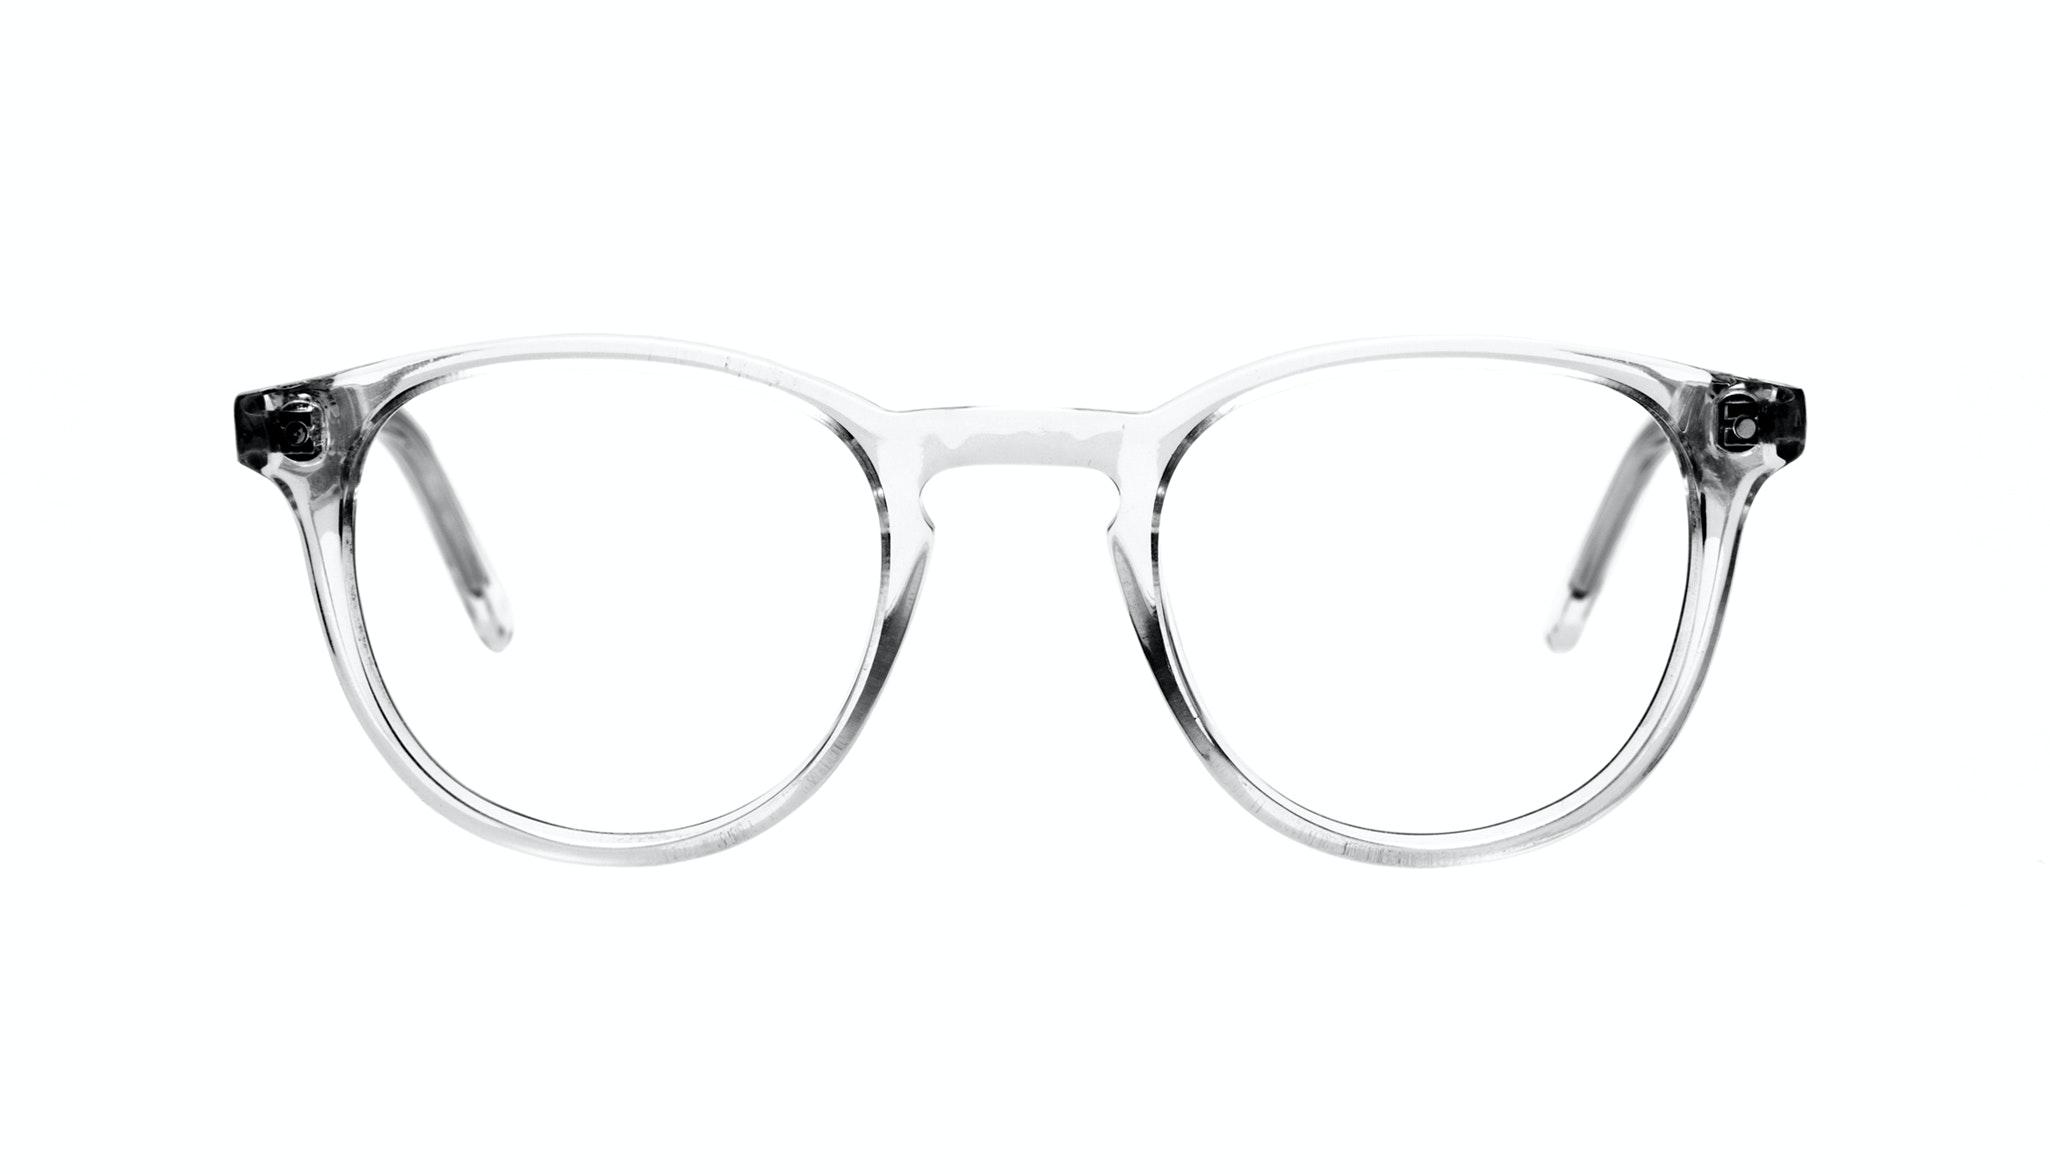 Affordable Fashion Glasses Round Eyeglasses Men Women Cult Diamond Front